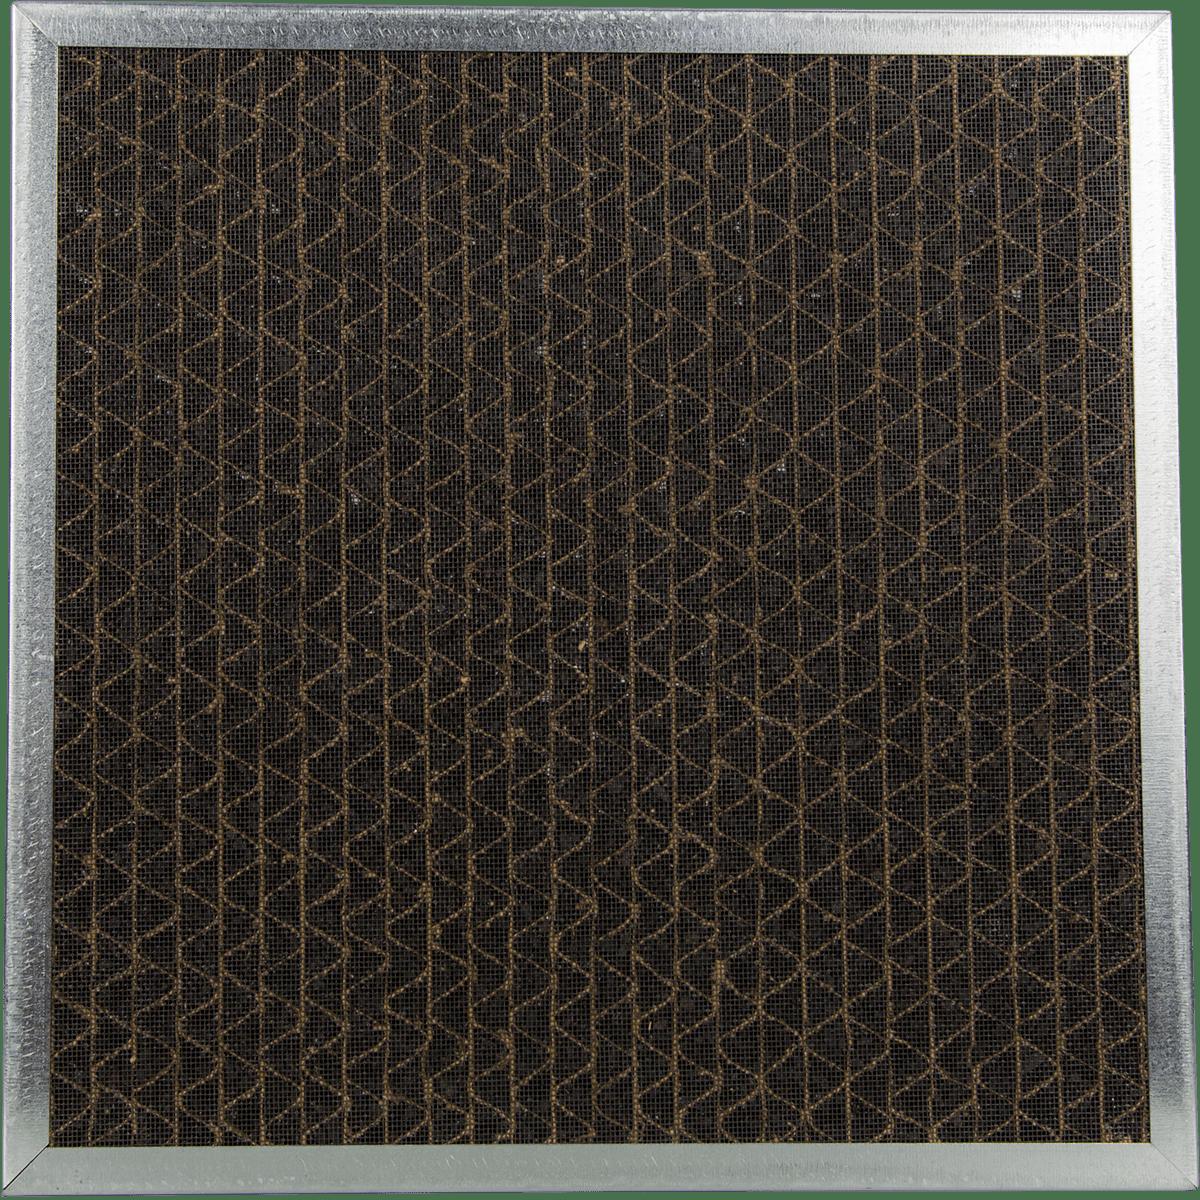 Phoenix Carbon / Potassium Filter, 7.5 lbs. (4024879) ph1509